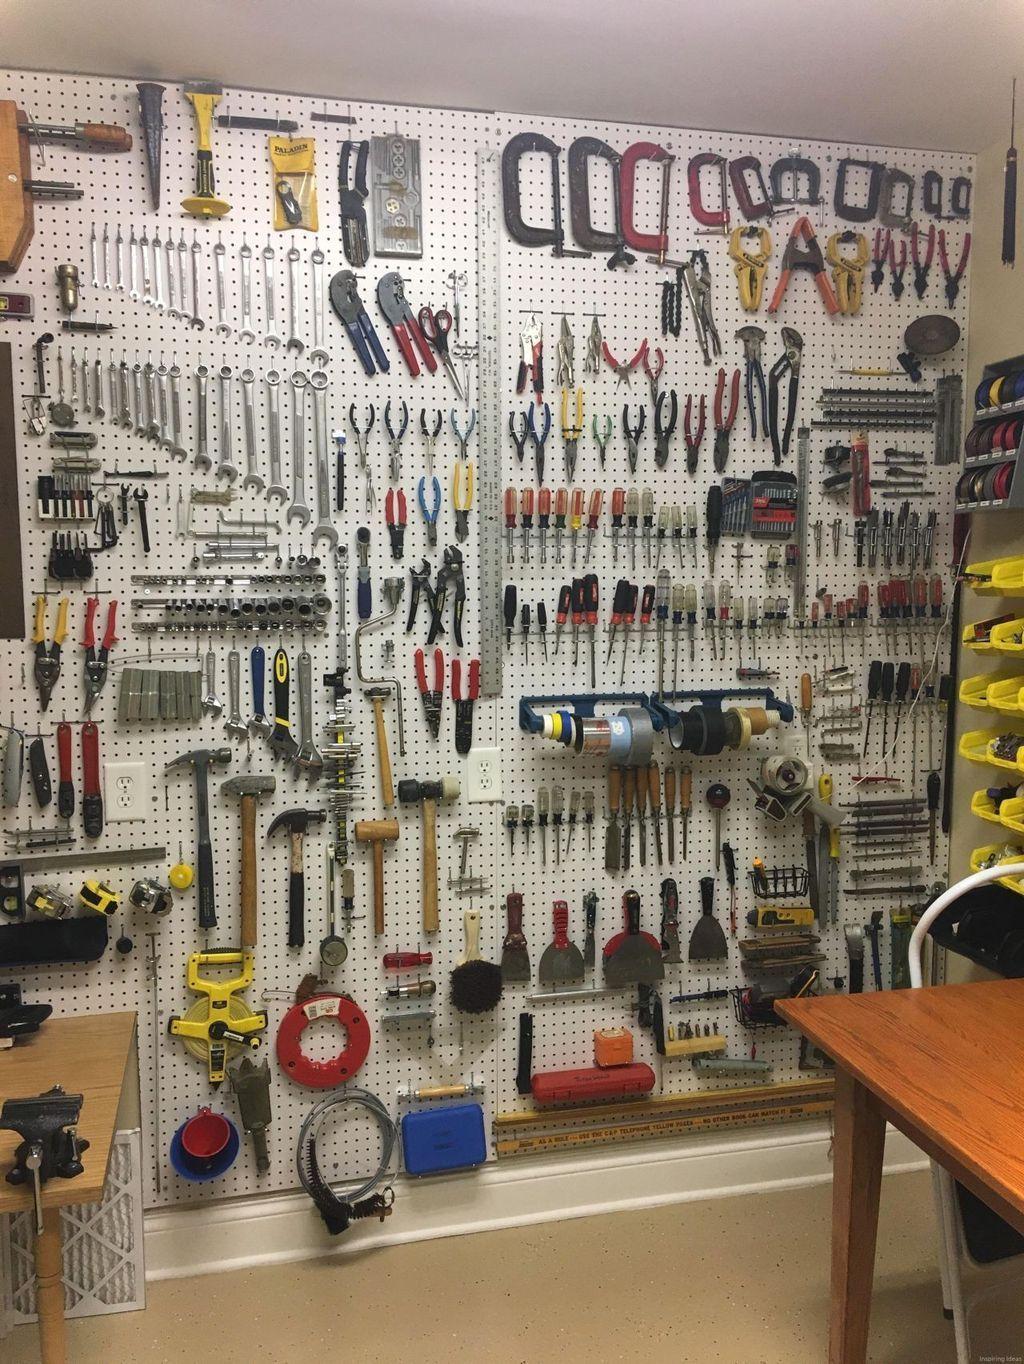 47 brilliant tool garage organization storage ideas on best garage organization and storage hacks ideas start for organizing your garage id=88562